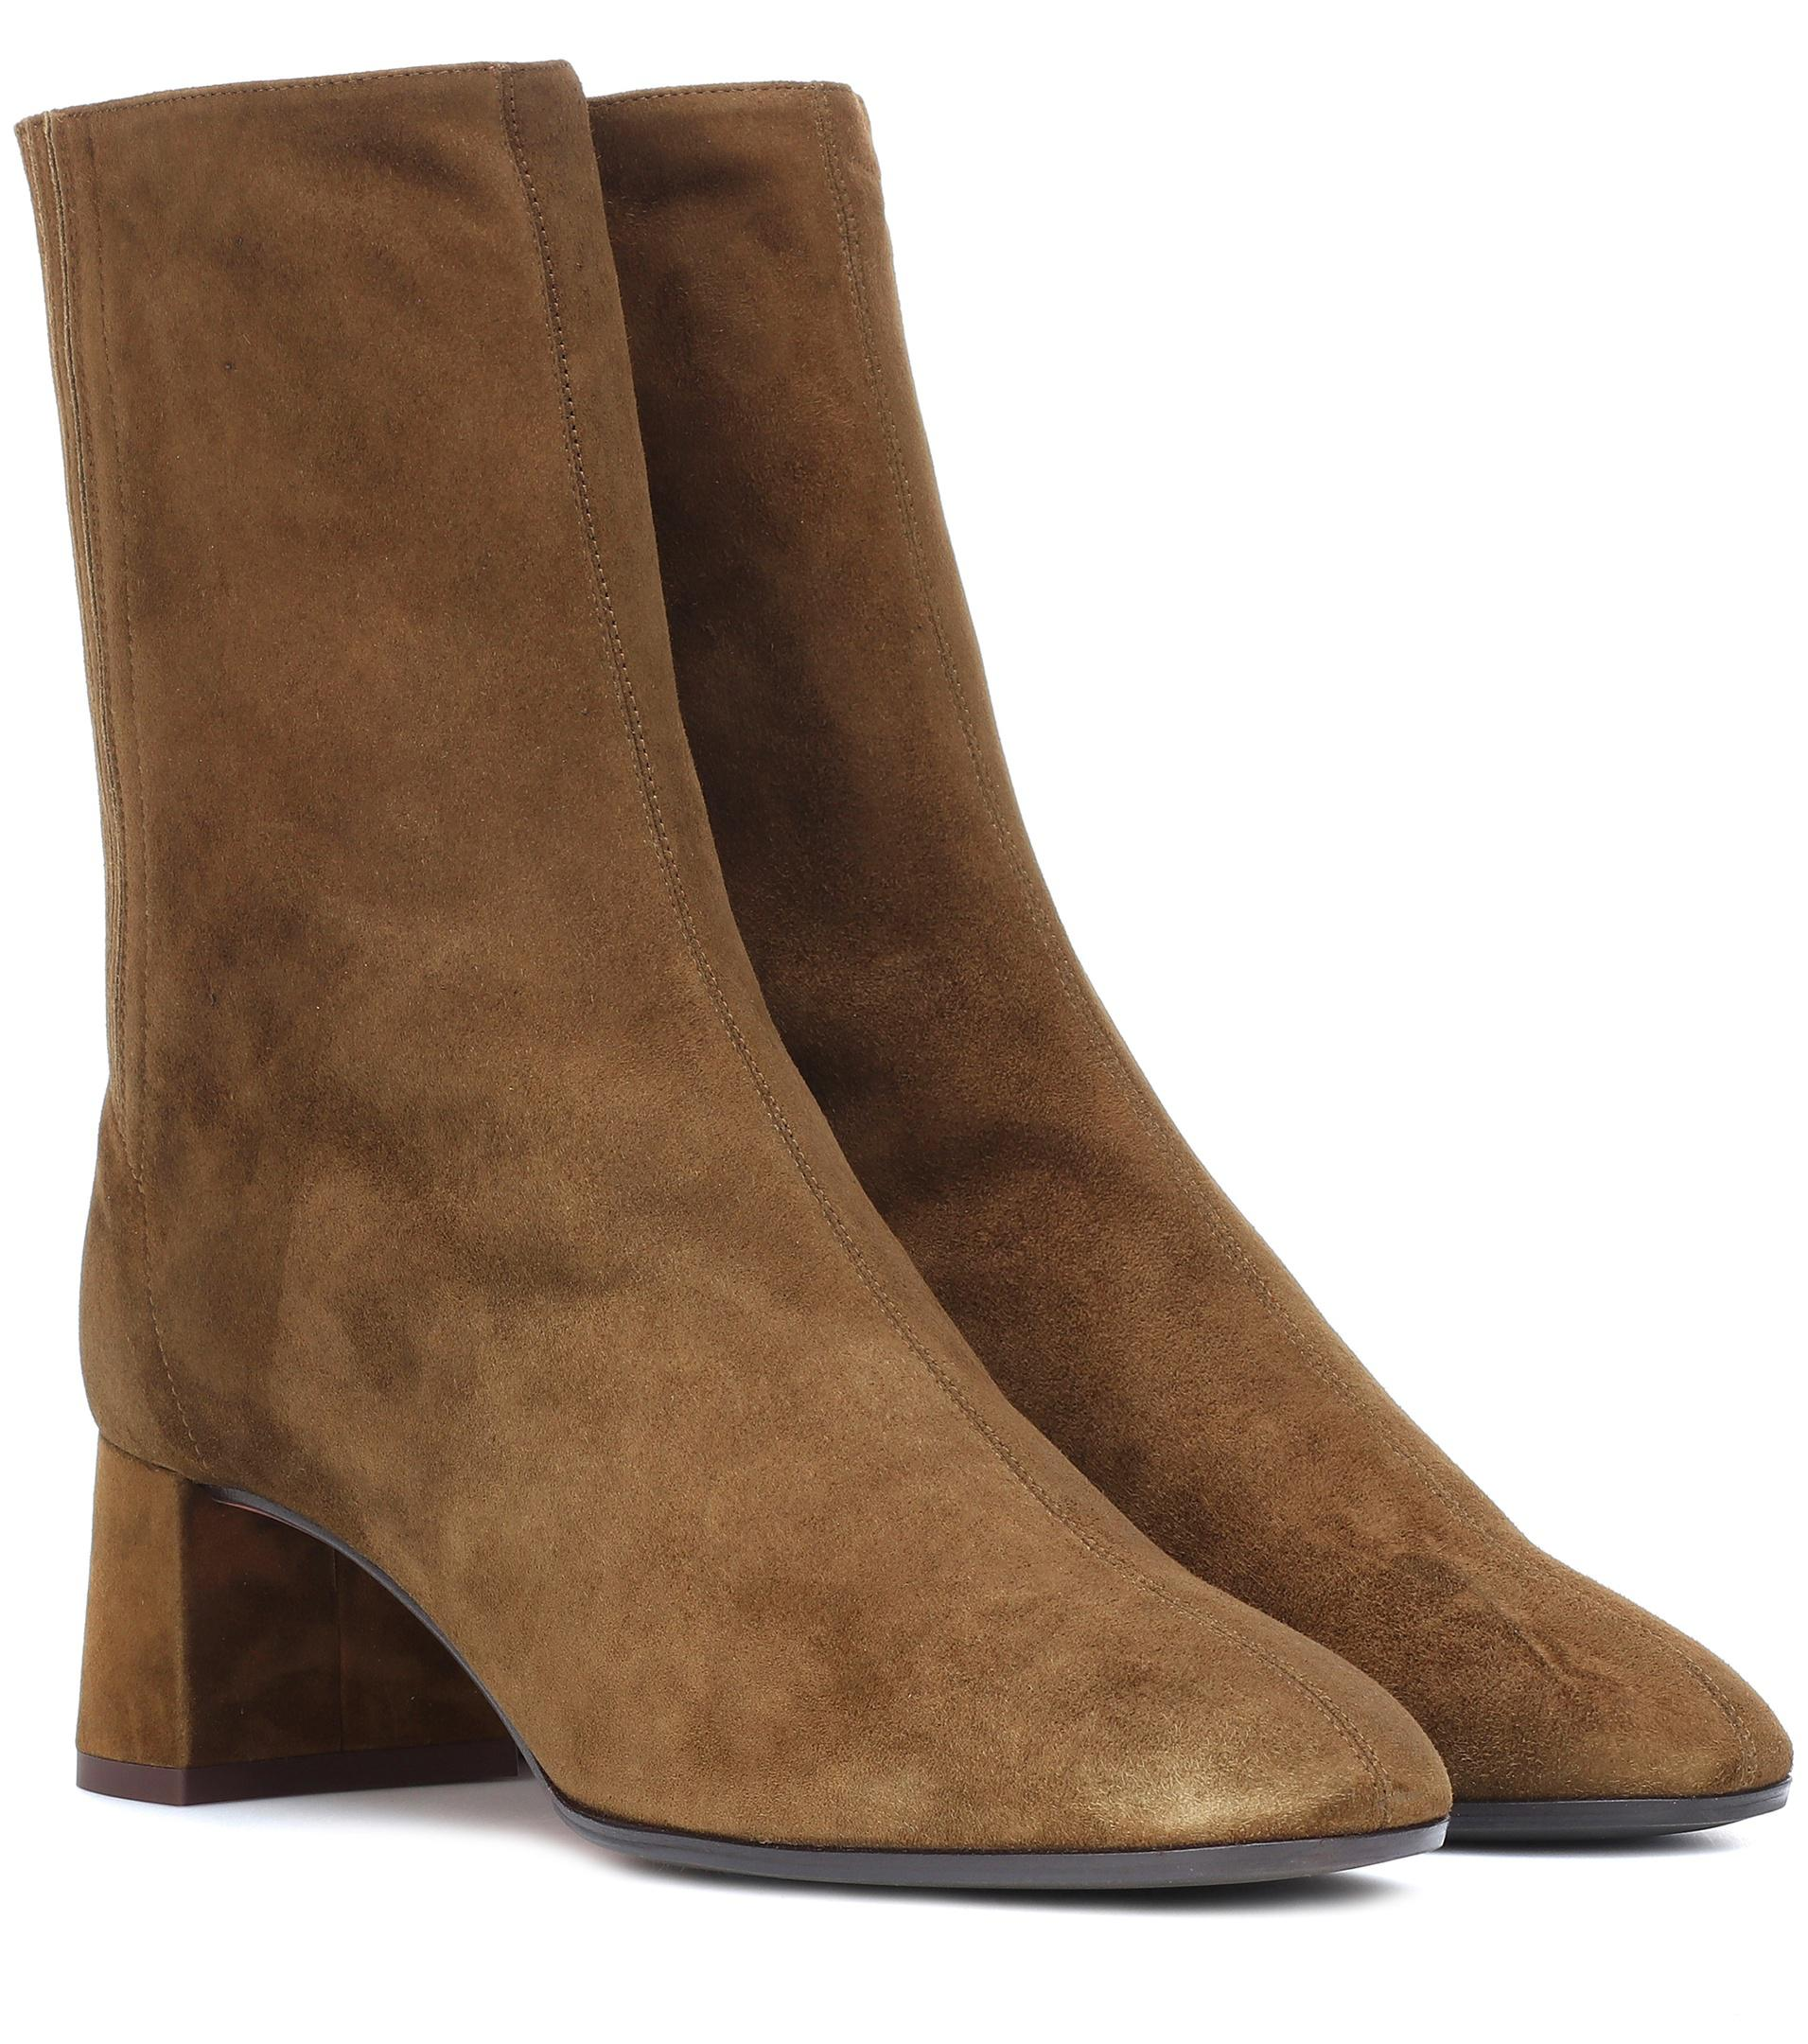 new cheap price Aquazzura Saint Honoré 50 suede ankle boots discount Cheapest WHkV6nQ